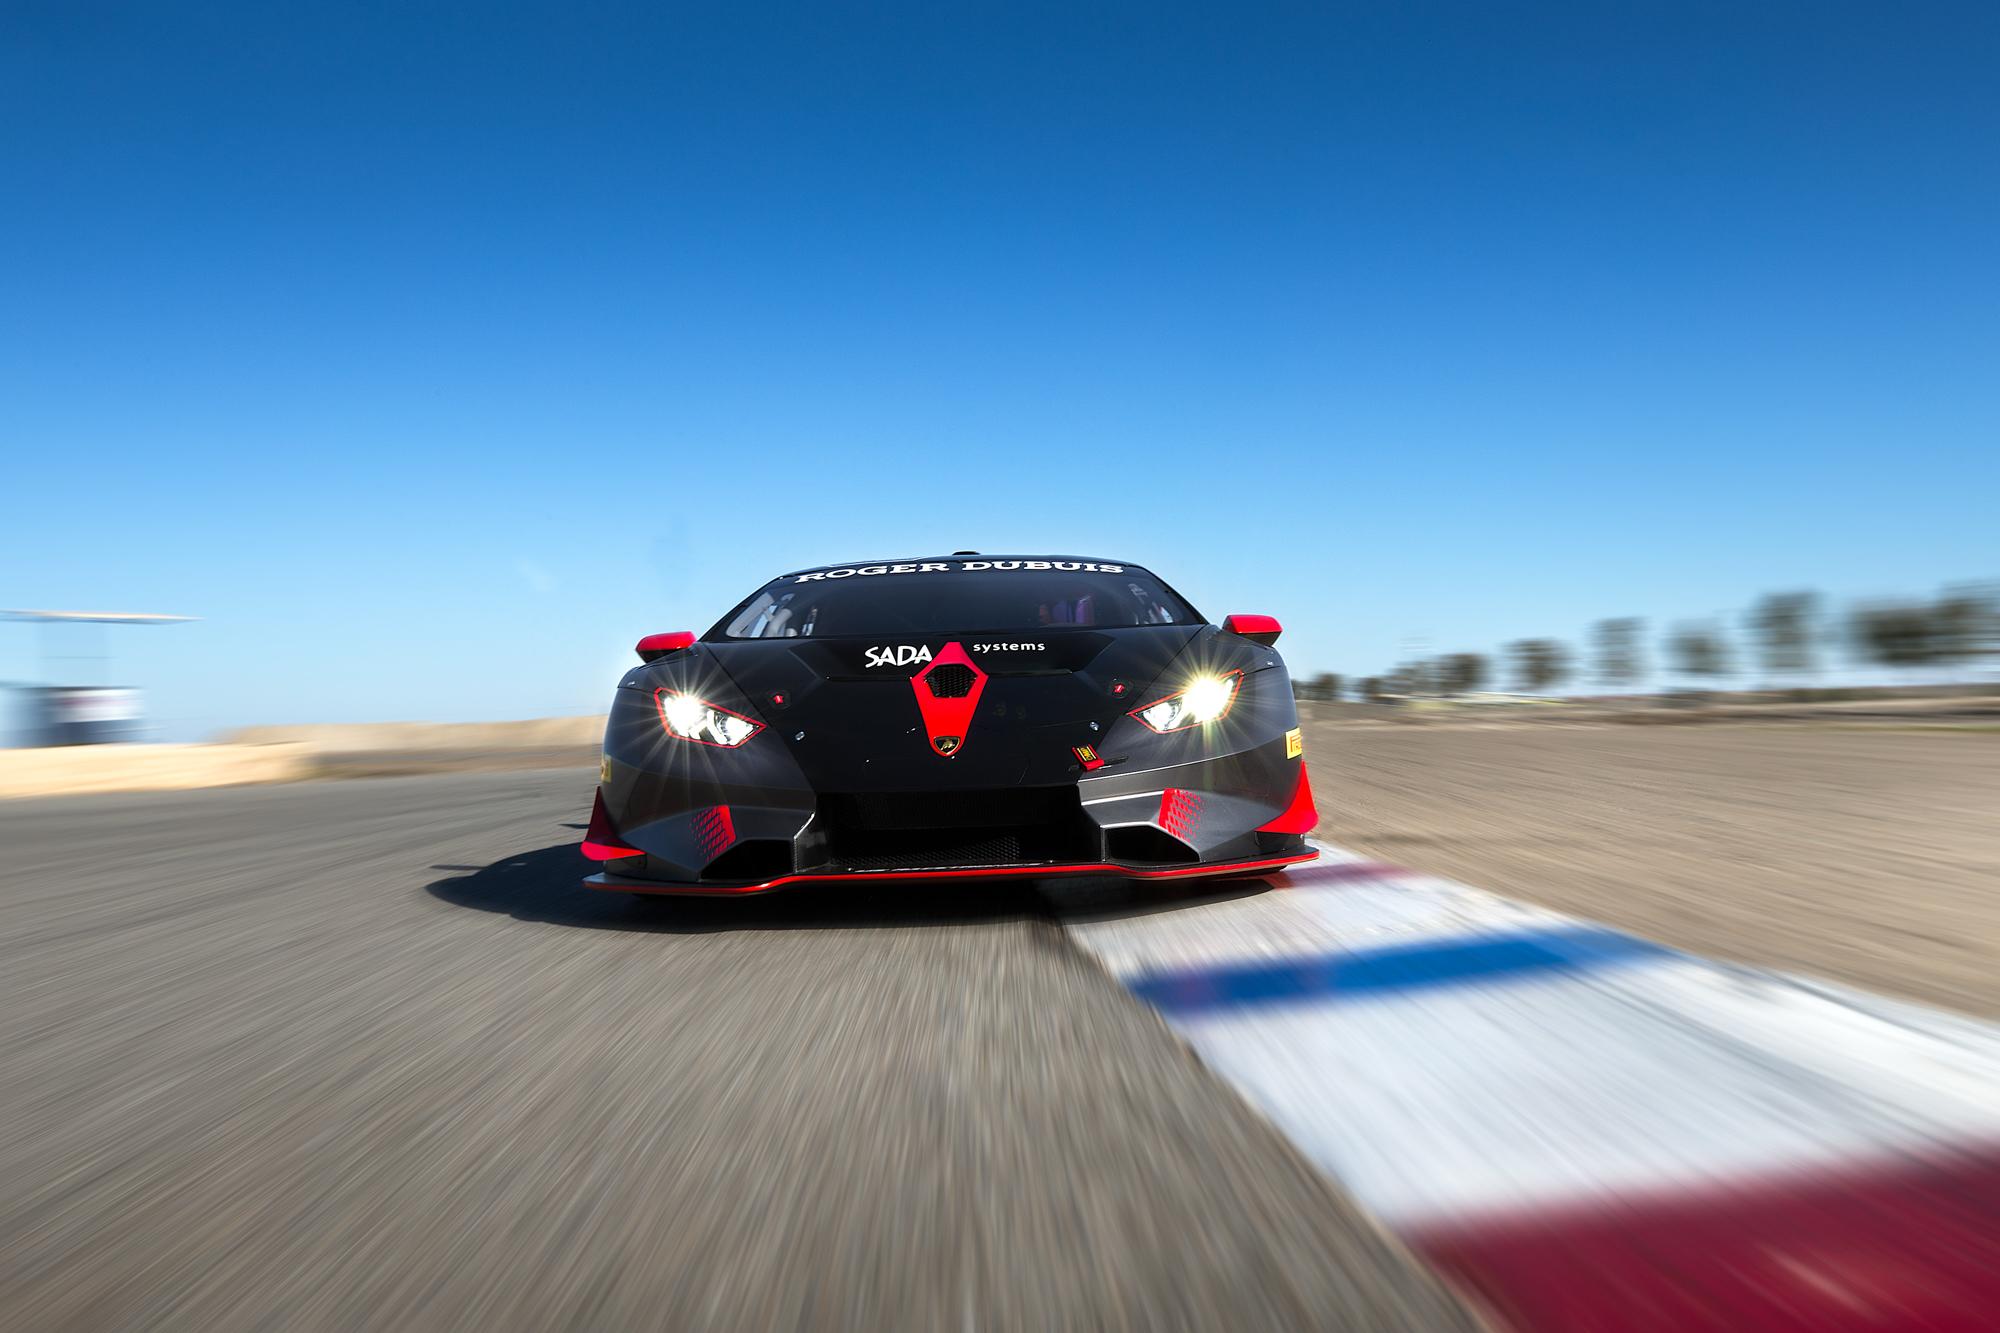 Steven-Racing-20180221-70395.jpg